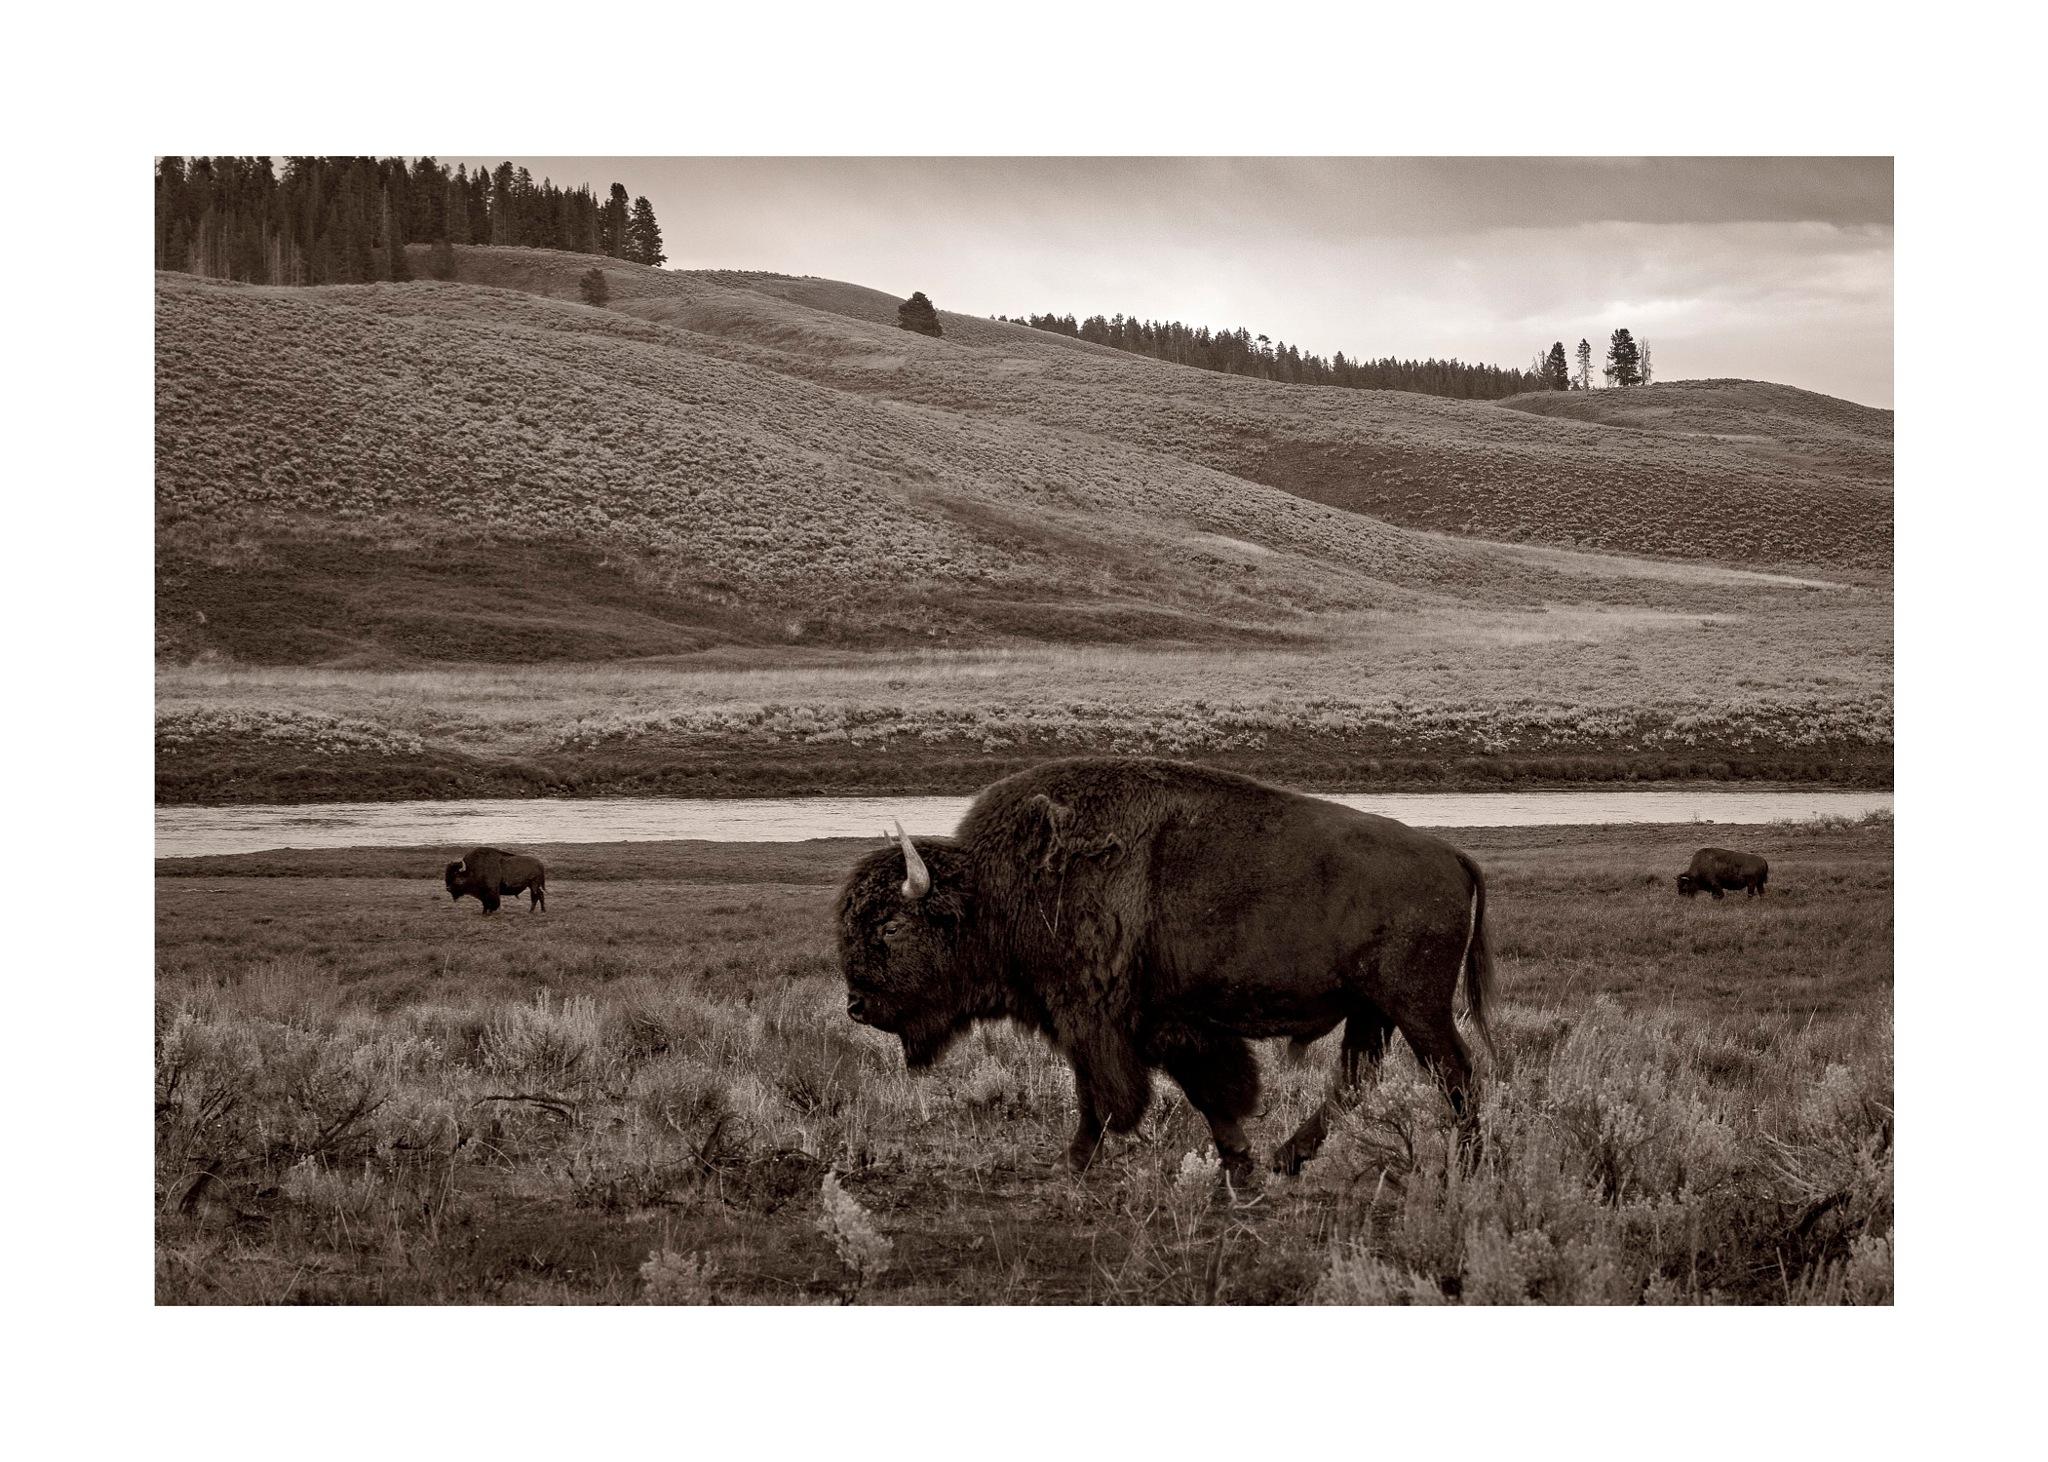 Yellowstone Icon by jhulton